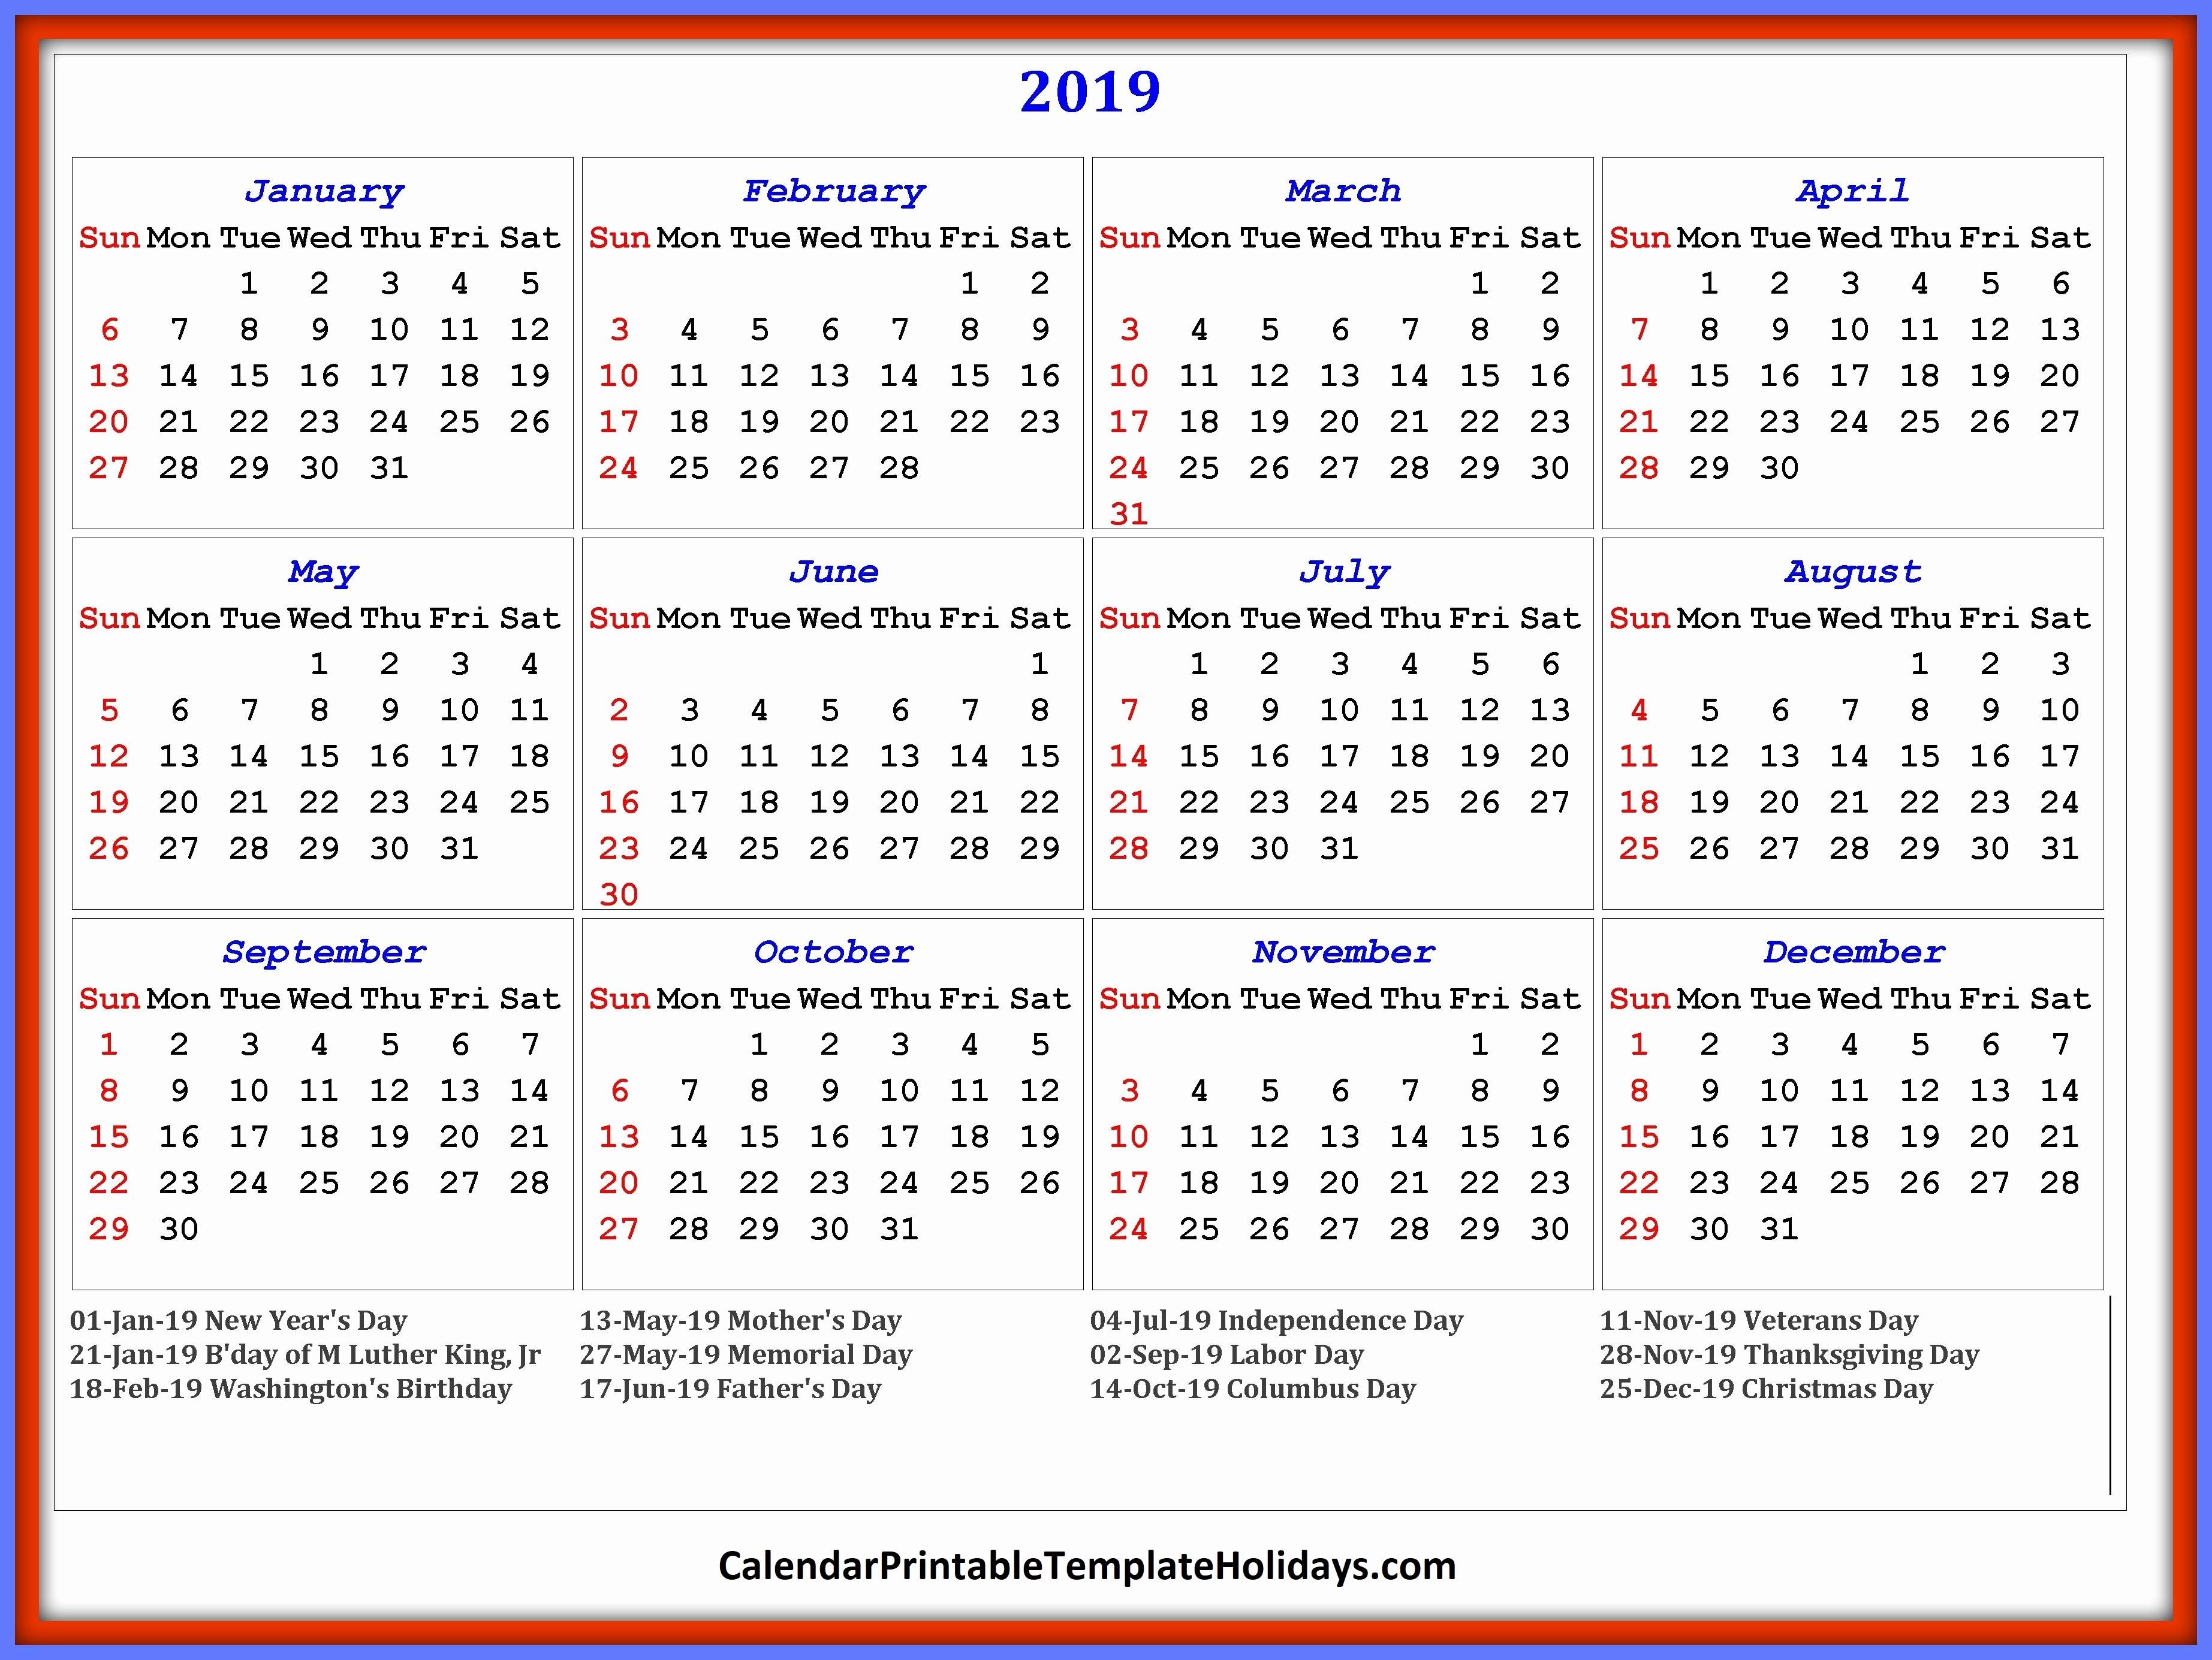 2019 Word Calendar with Holidays Luxury 2019 Calendar Printable Template Holidays Pdf Word Excel